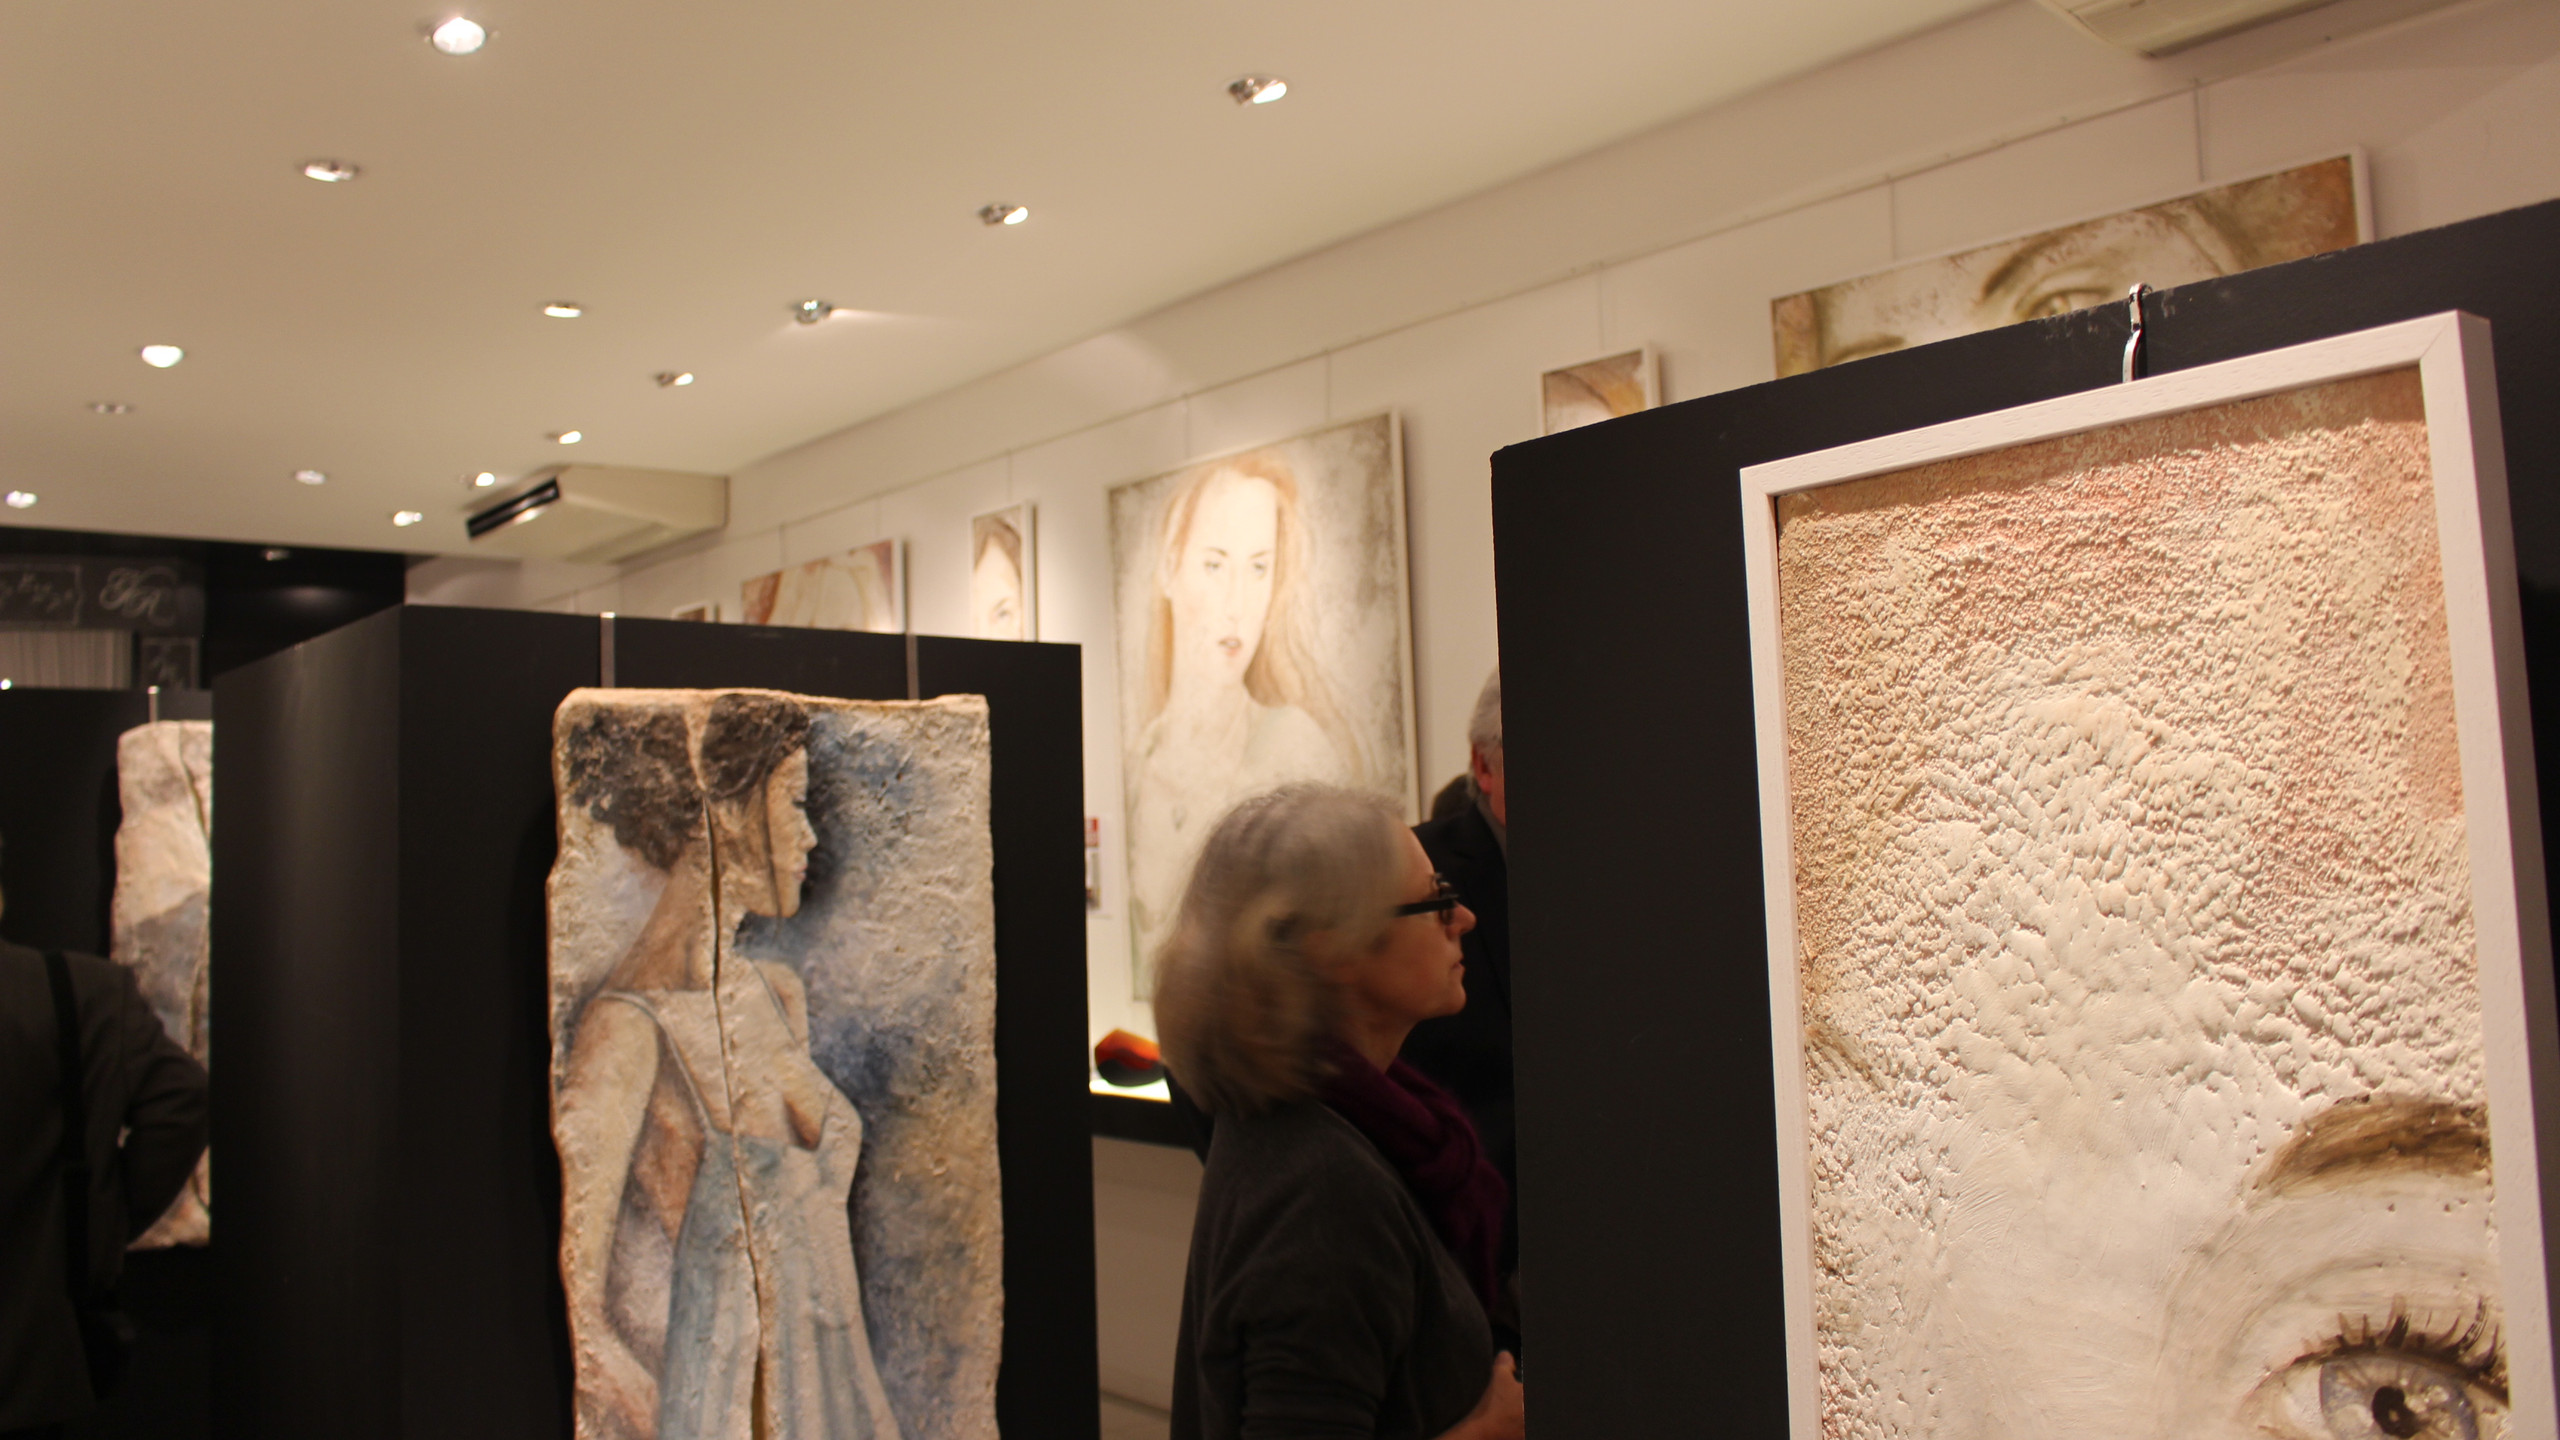 Nathalie Béguier, Galerie Royale